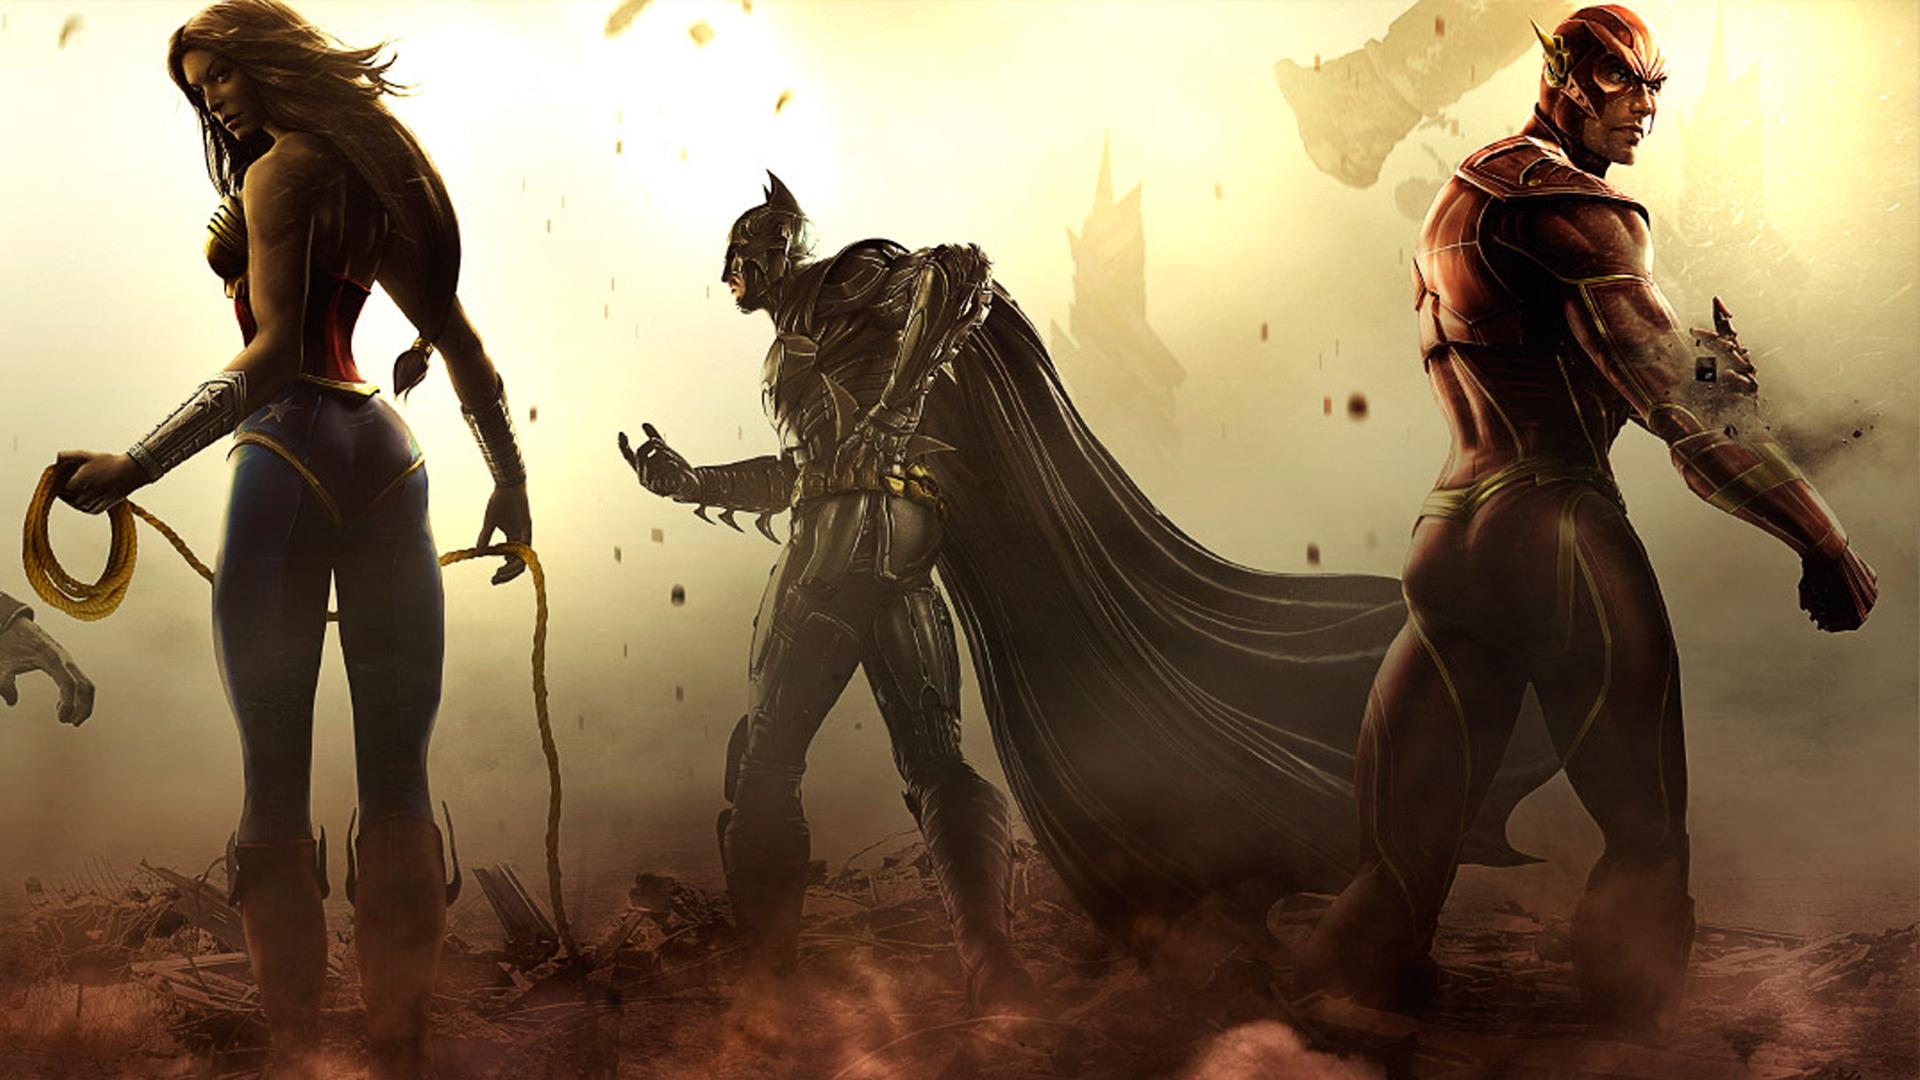 Injustice Gods Among Us wallpaper 9